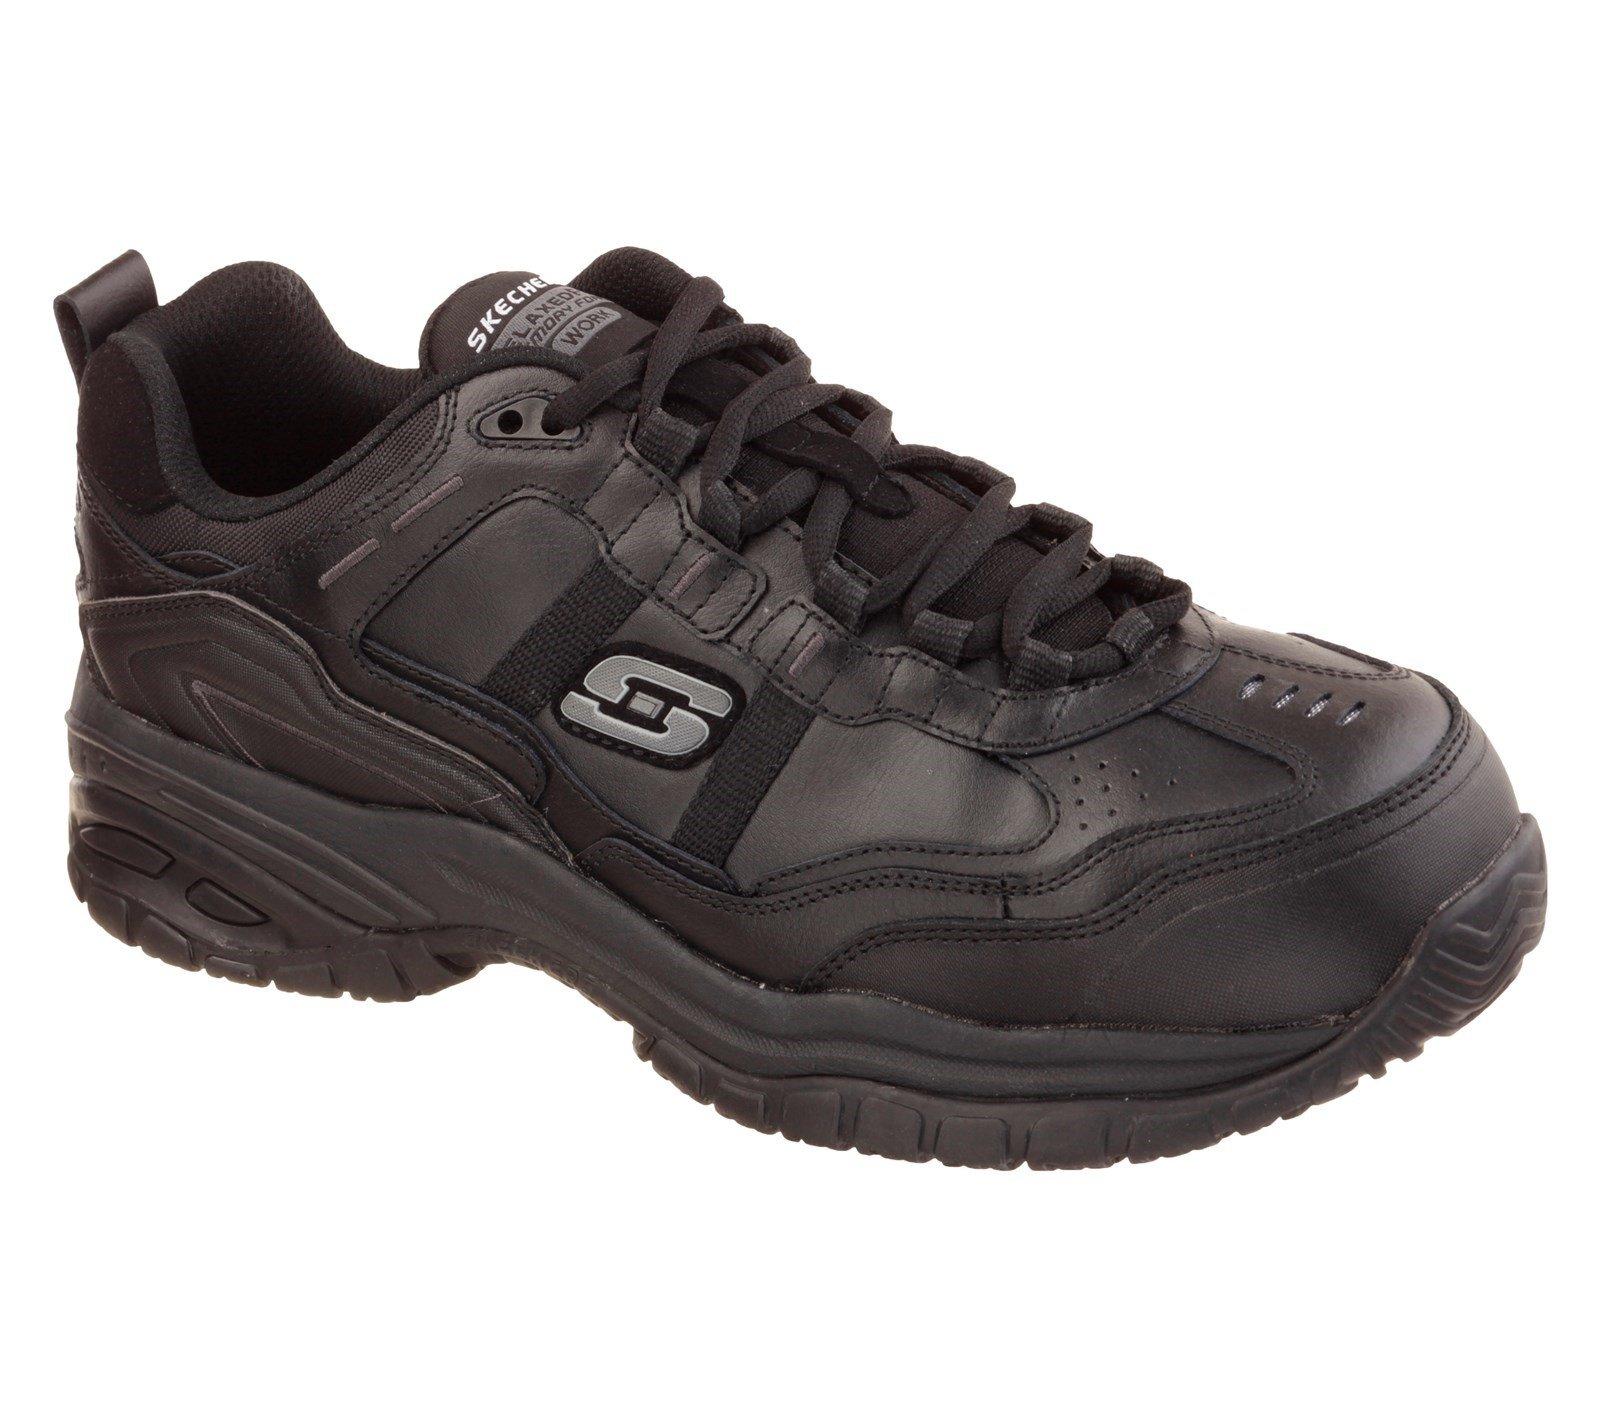 Skechers Unisex Soft Stride Grinnell Comp Safety Trainer Black 32952 - Black 8